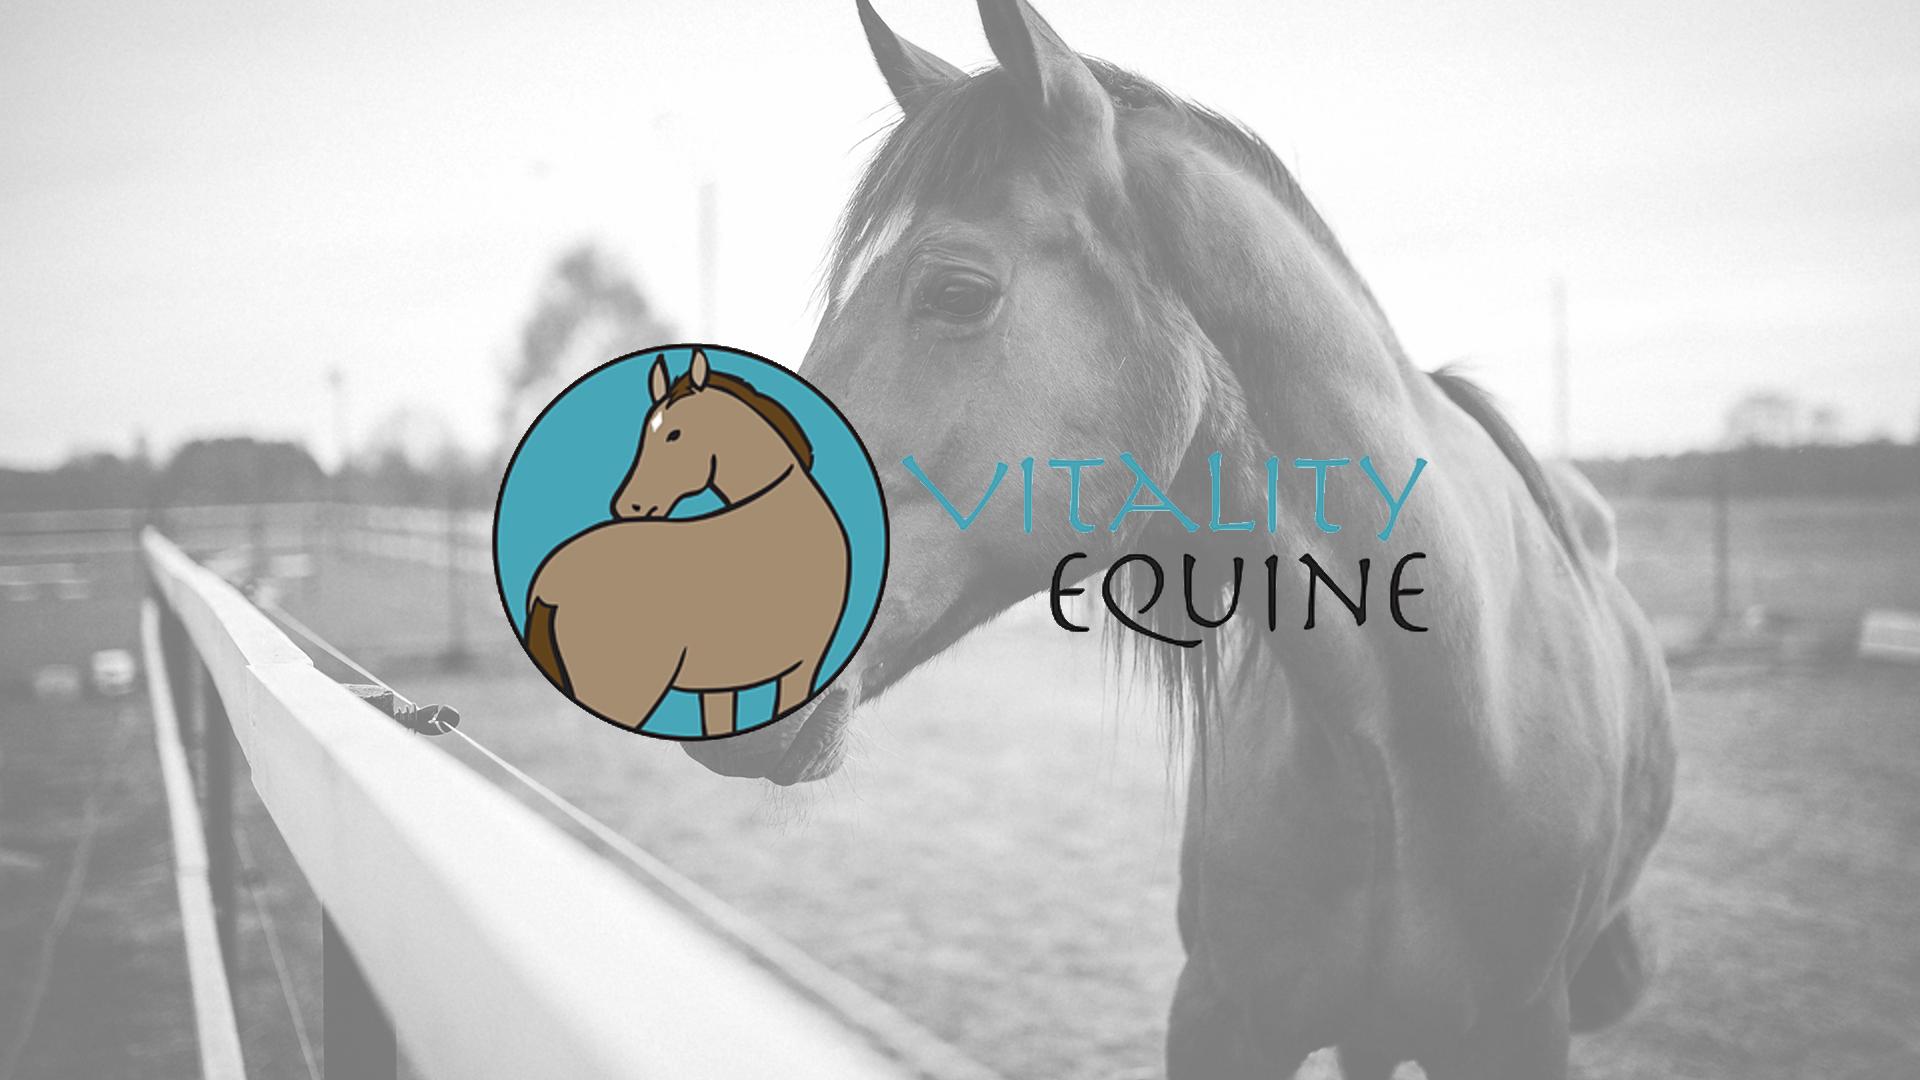 Vitality Equine